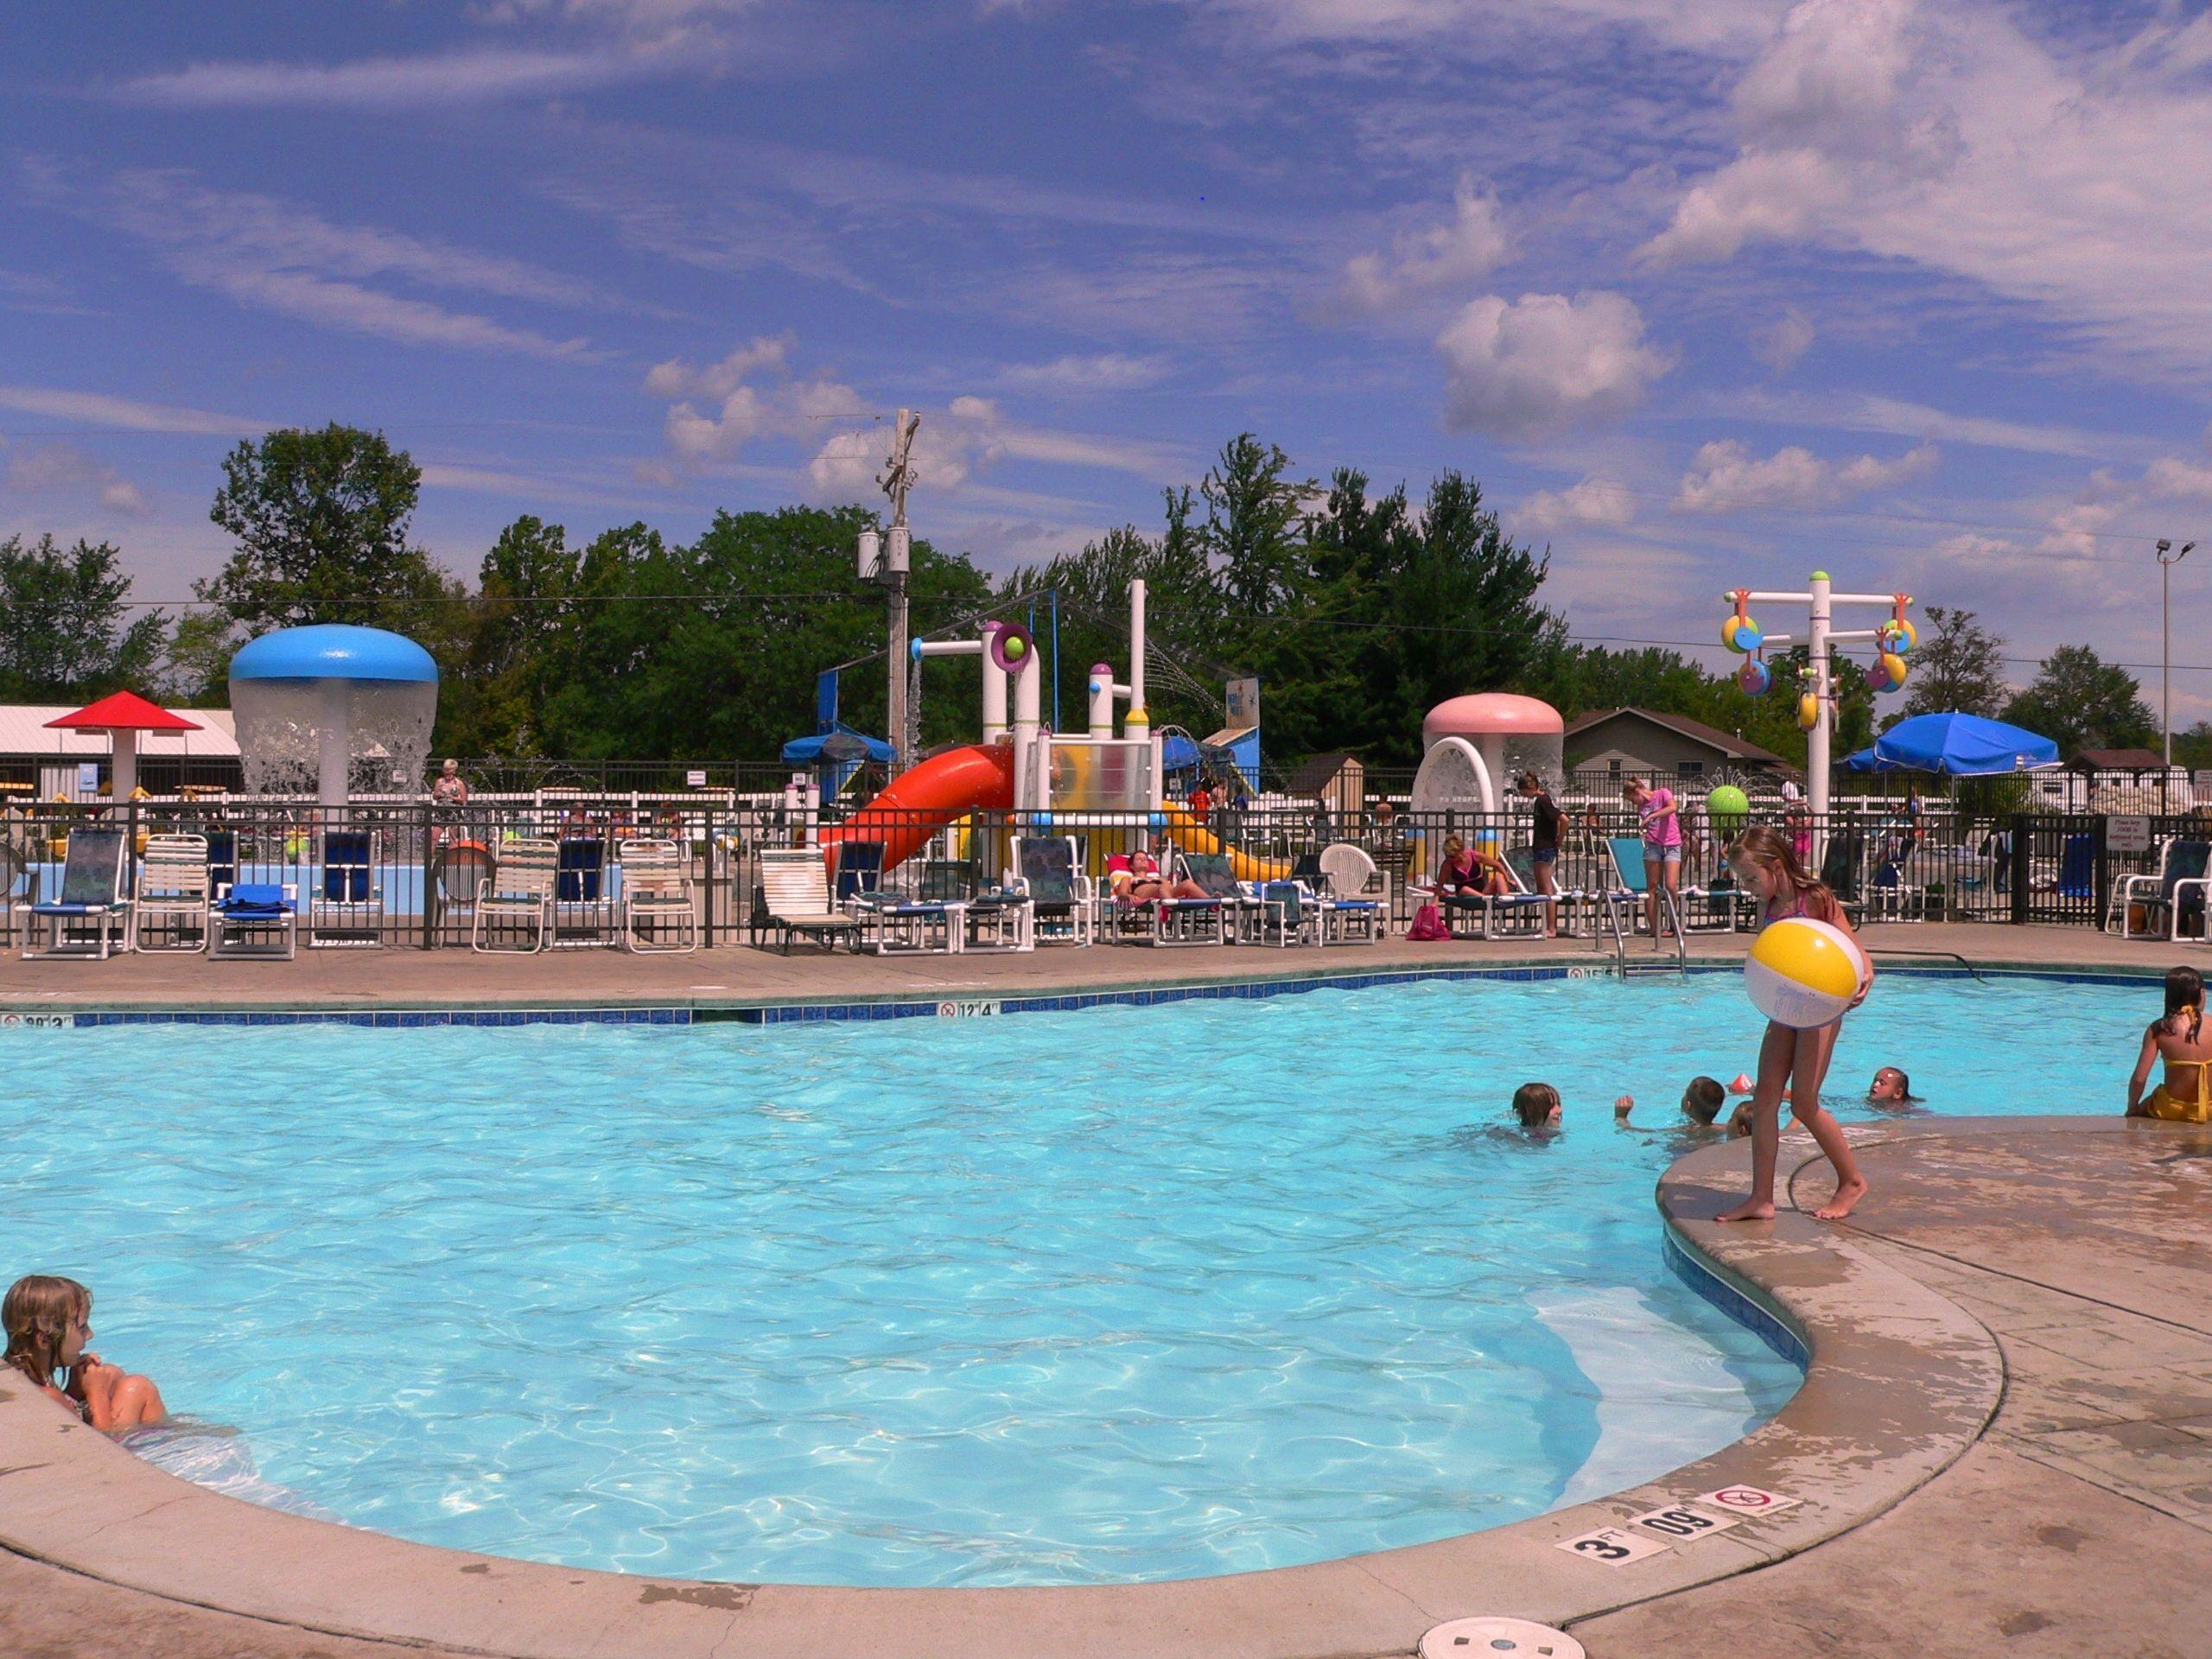 Yogi Bears Jellystone Park™ Camp Resort at Barton Lake